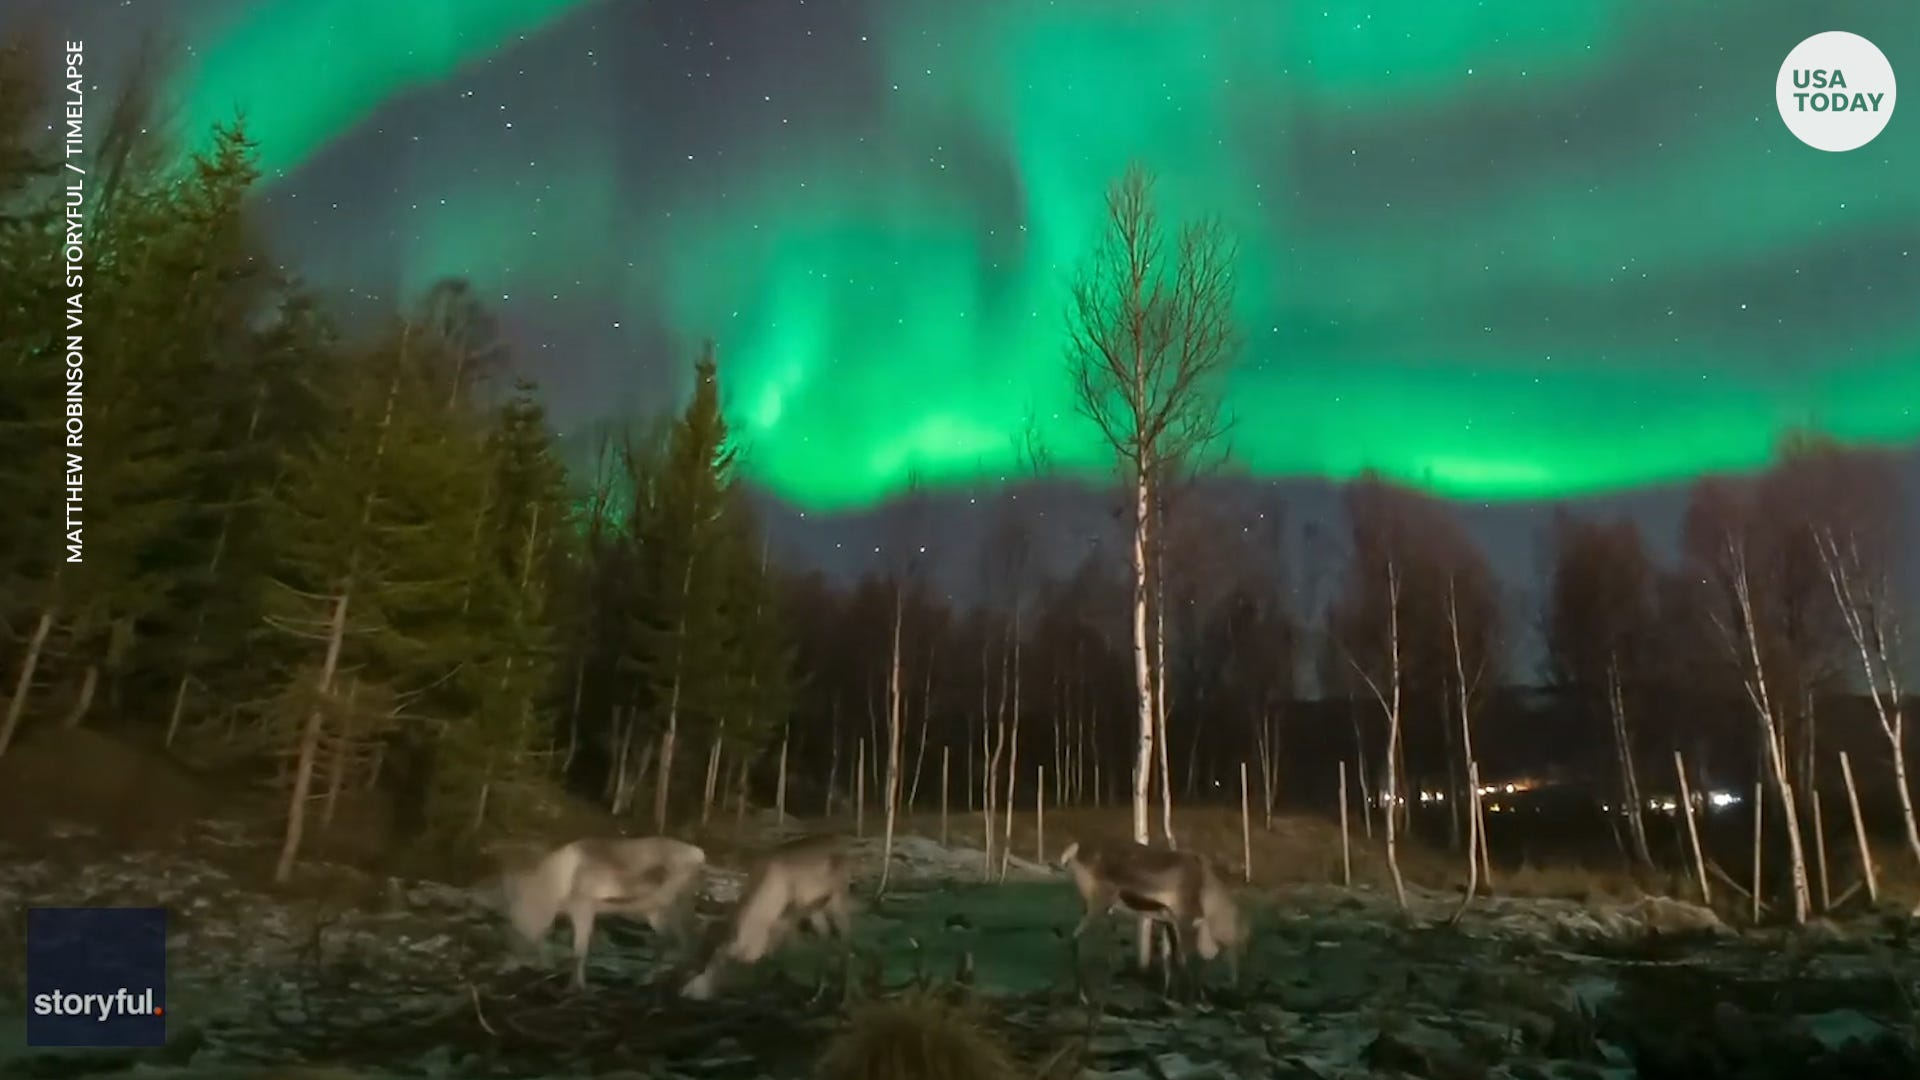 Reindeer unfazed by northern lights flickering above them